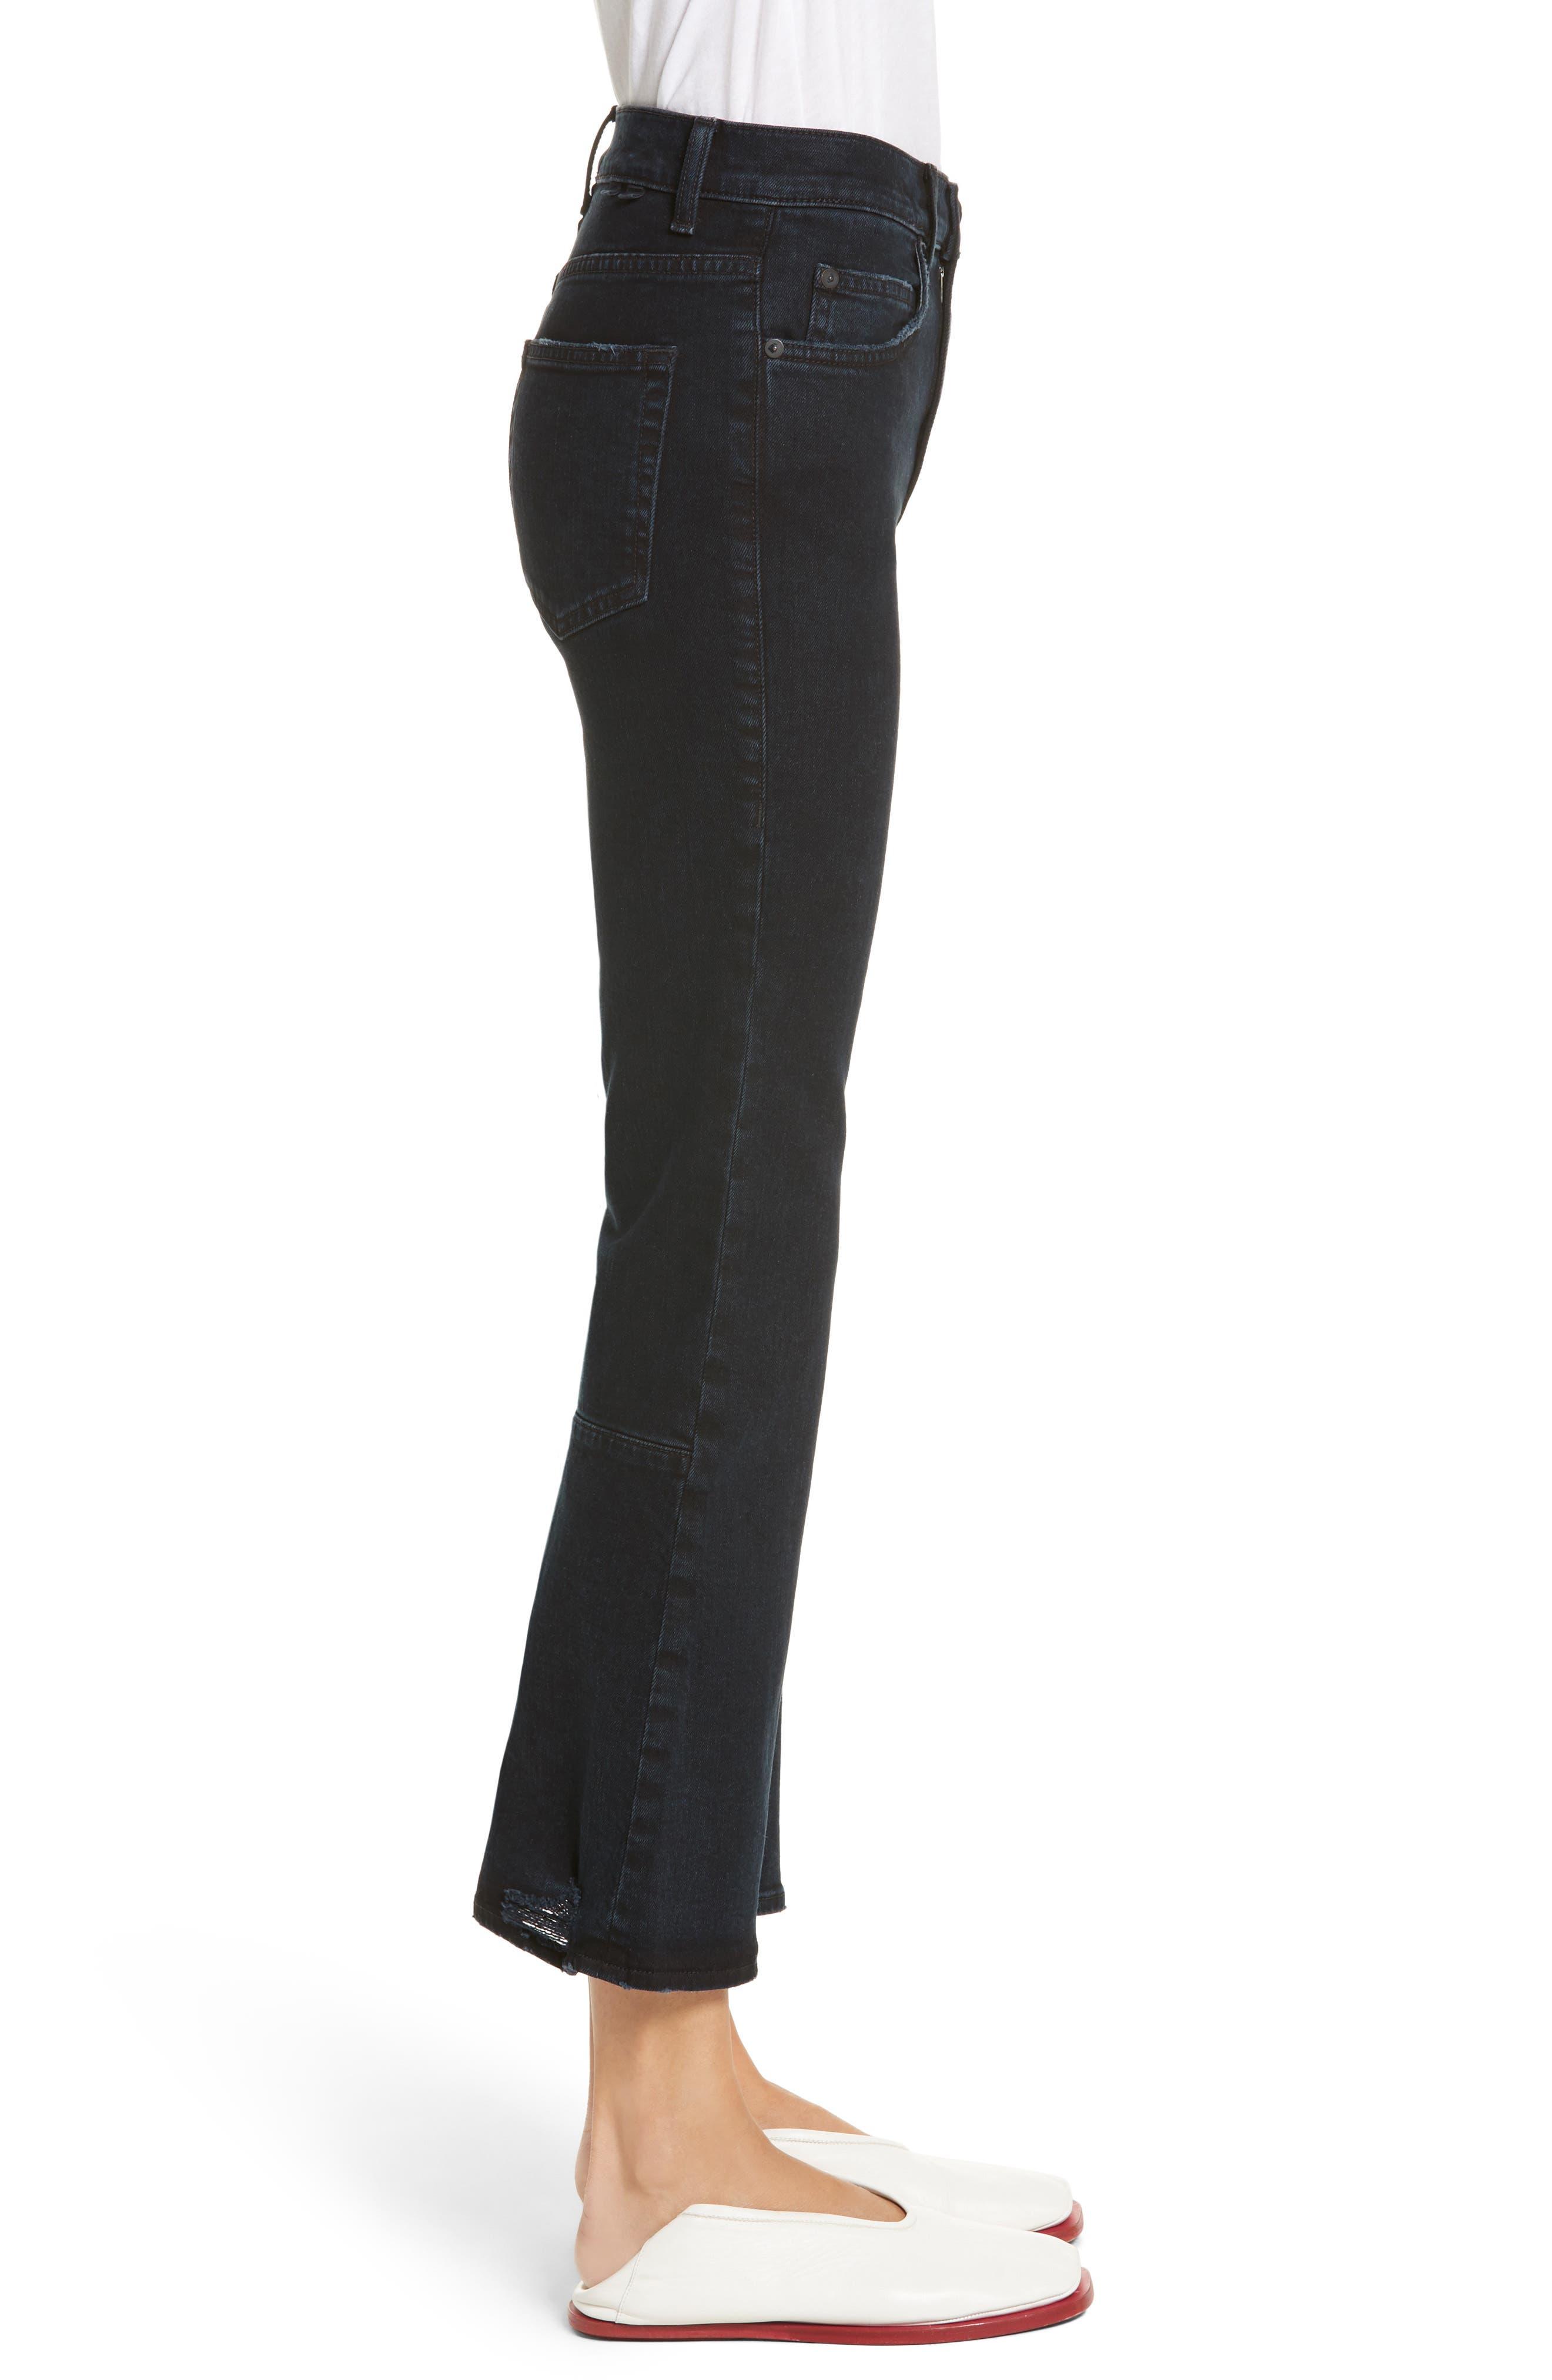 PSWL Crop Kick Flare Jeans,                             Alternate thumbnail 3, color,                             Stone Washed Black